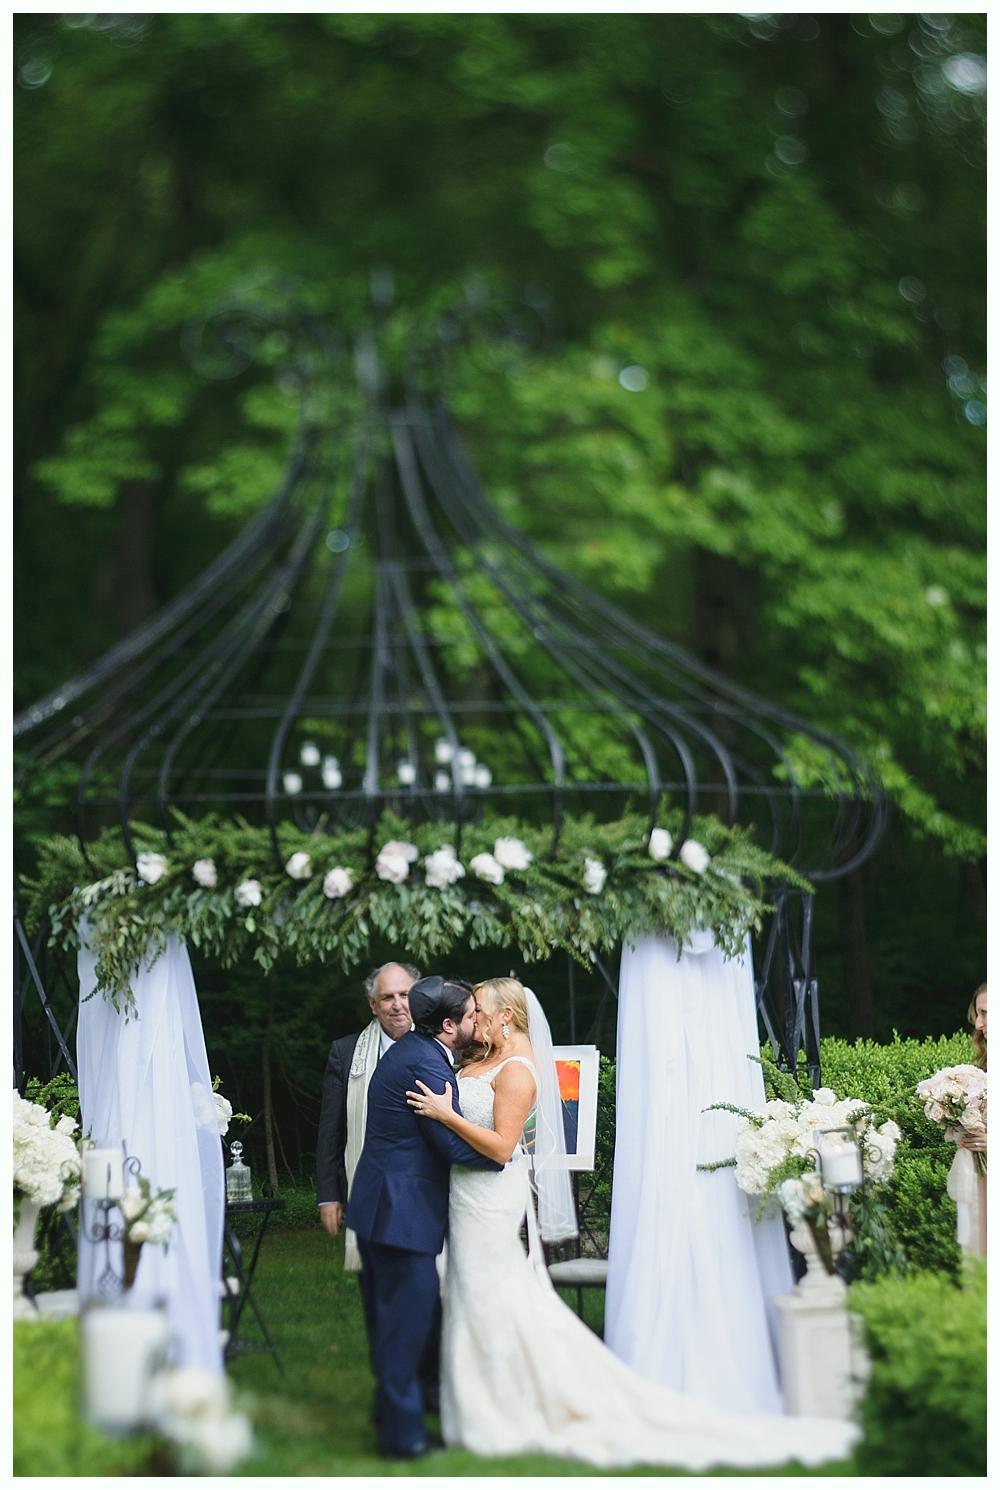 Lord_Thompson_Manor_Wedding_Photography_Luke_Wayne_48